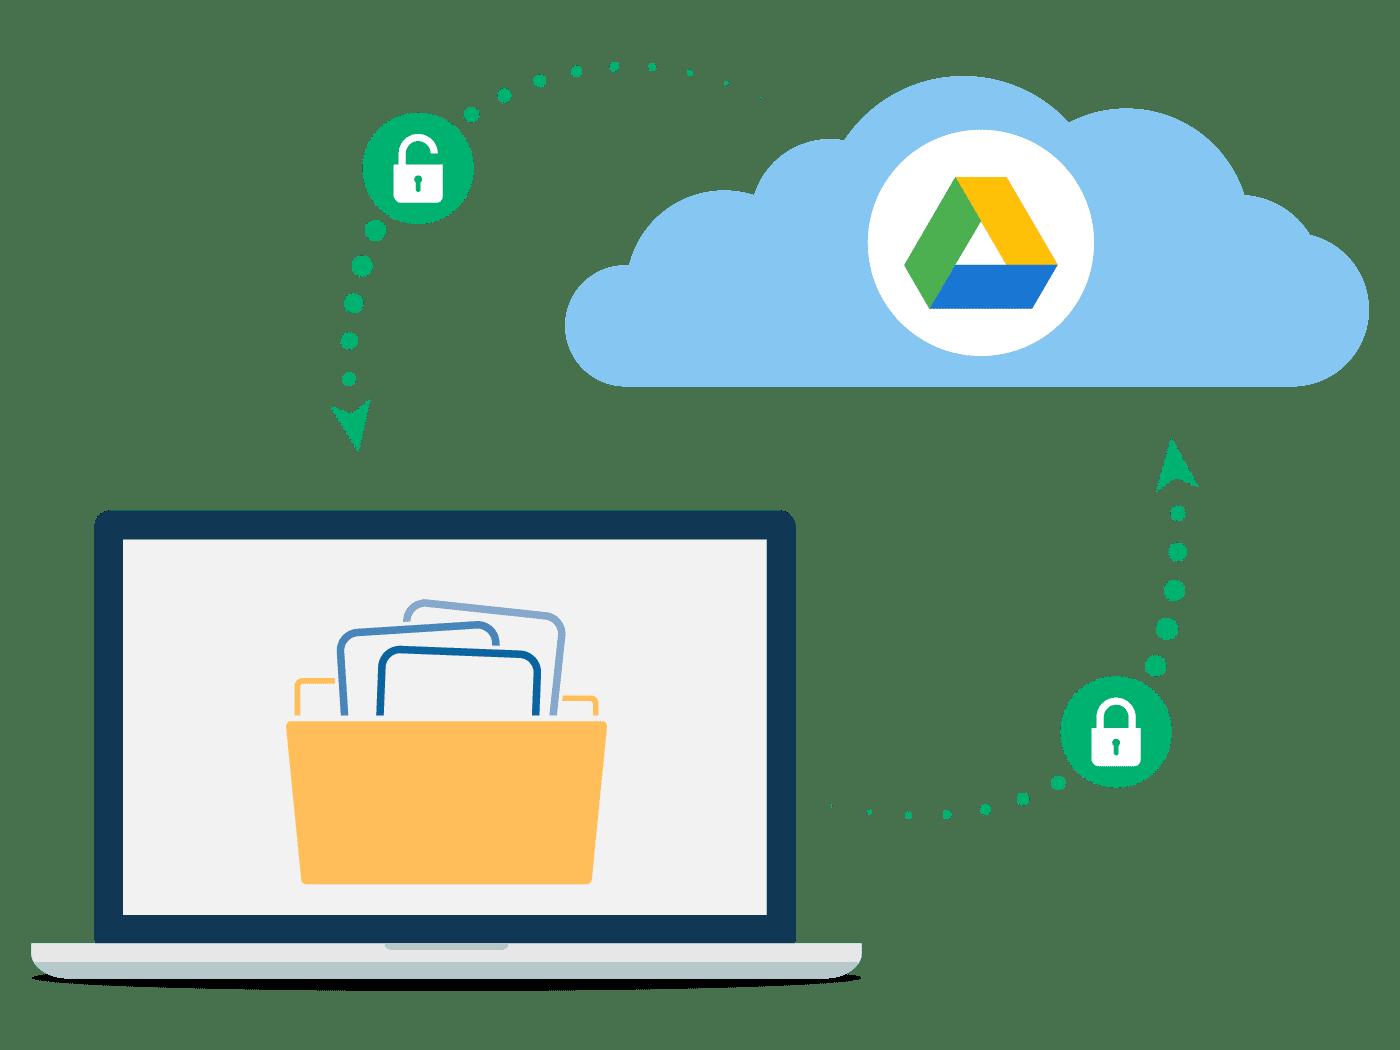 Google Drive Cloud Backup Services